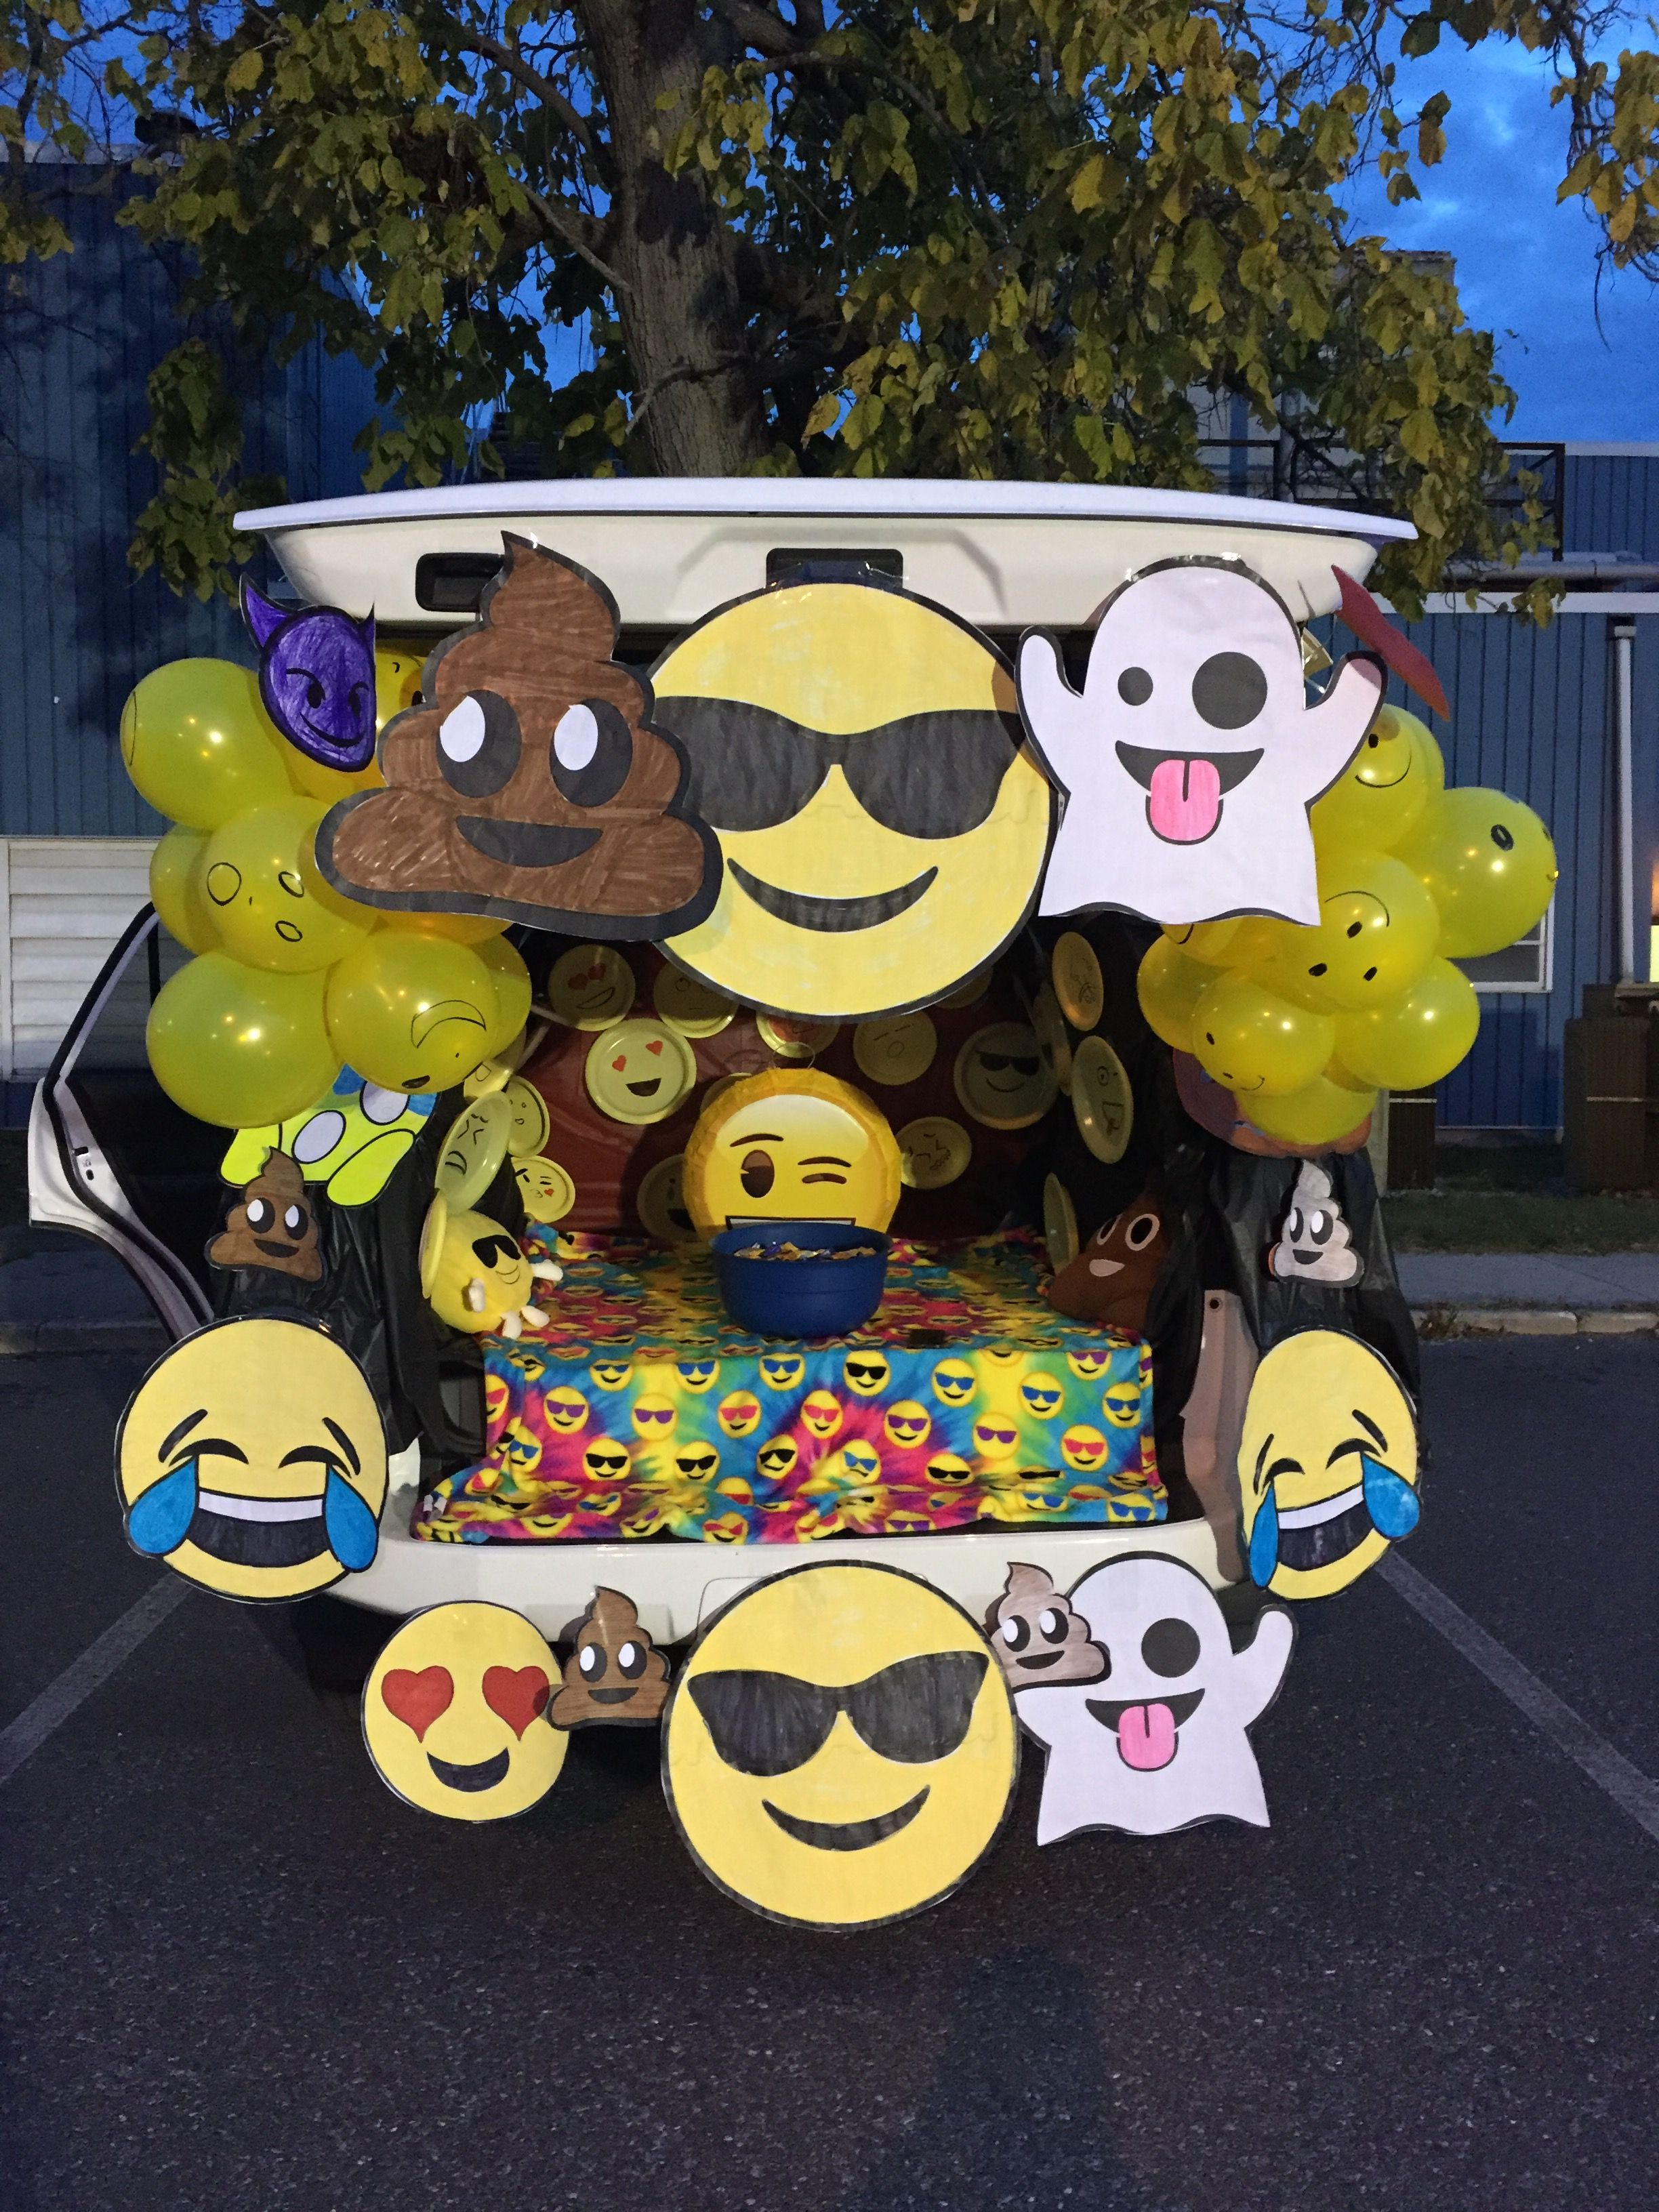 2019 Trunk Or Treat Ideas Emoji Trunk or Treat | Crafts in 2019 | Trunk or treat, Truck or